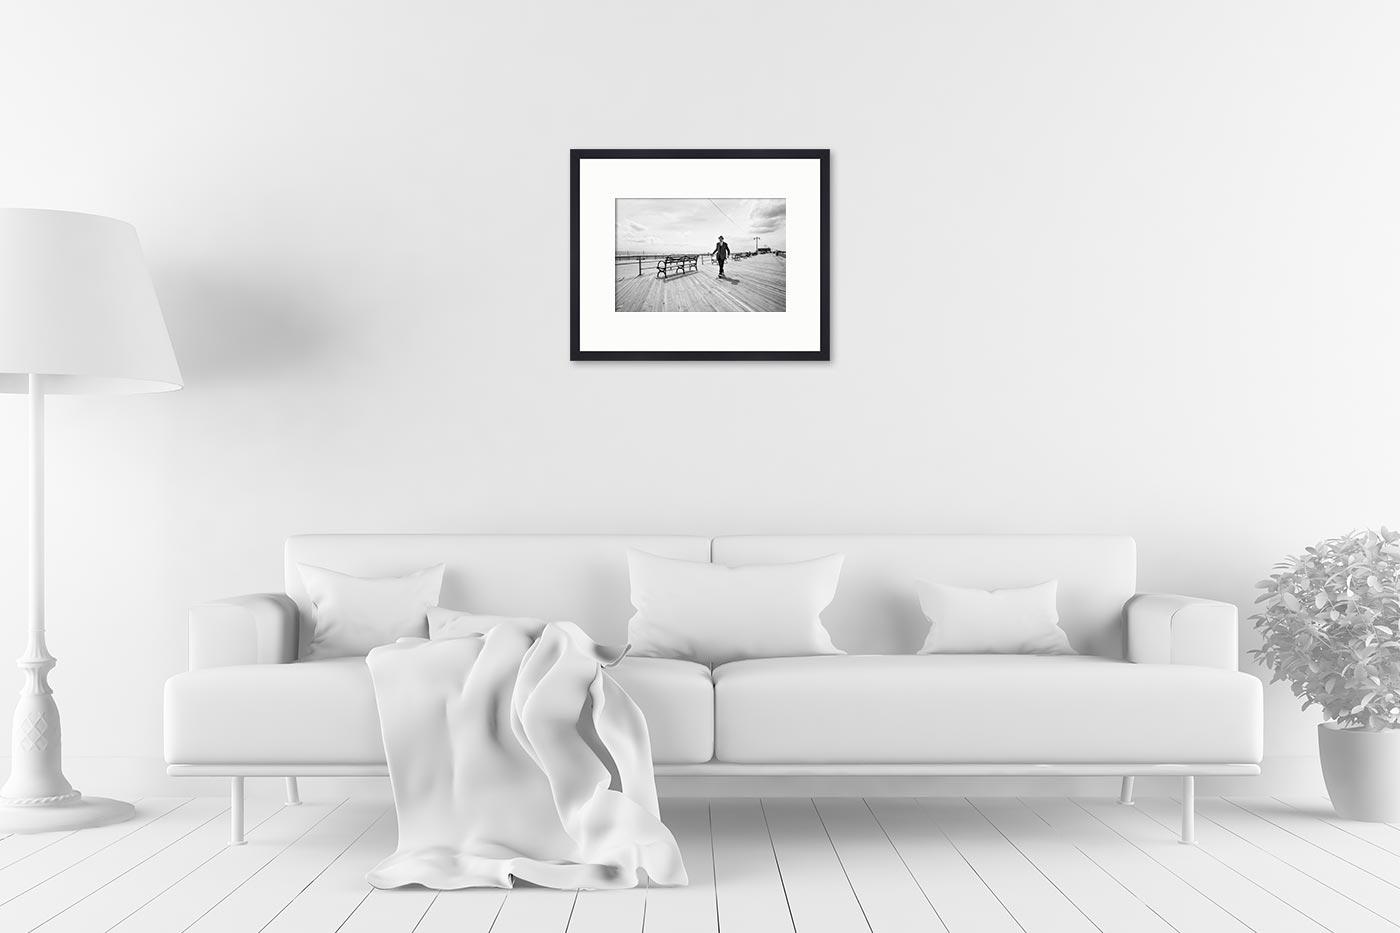 Cadre galerie 40x50 Coney Island Man